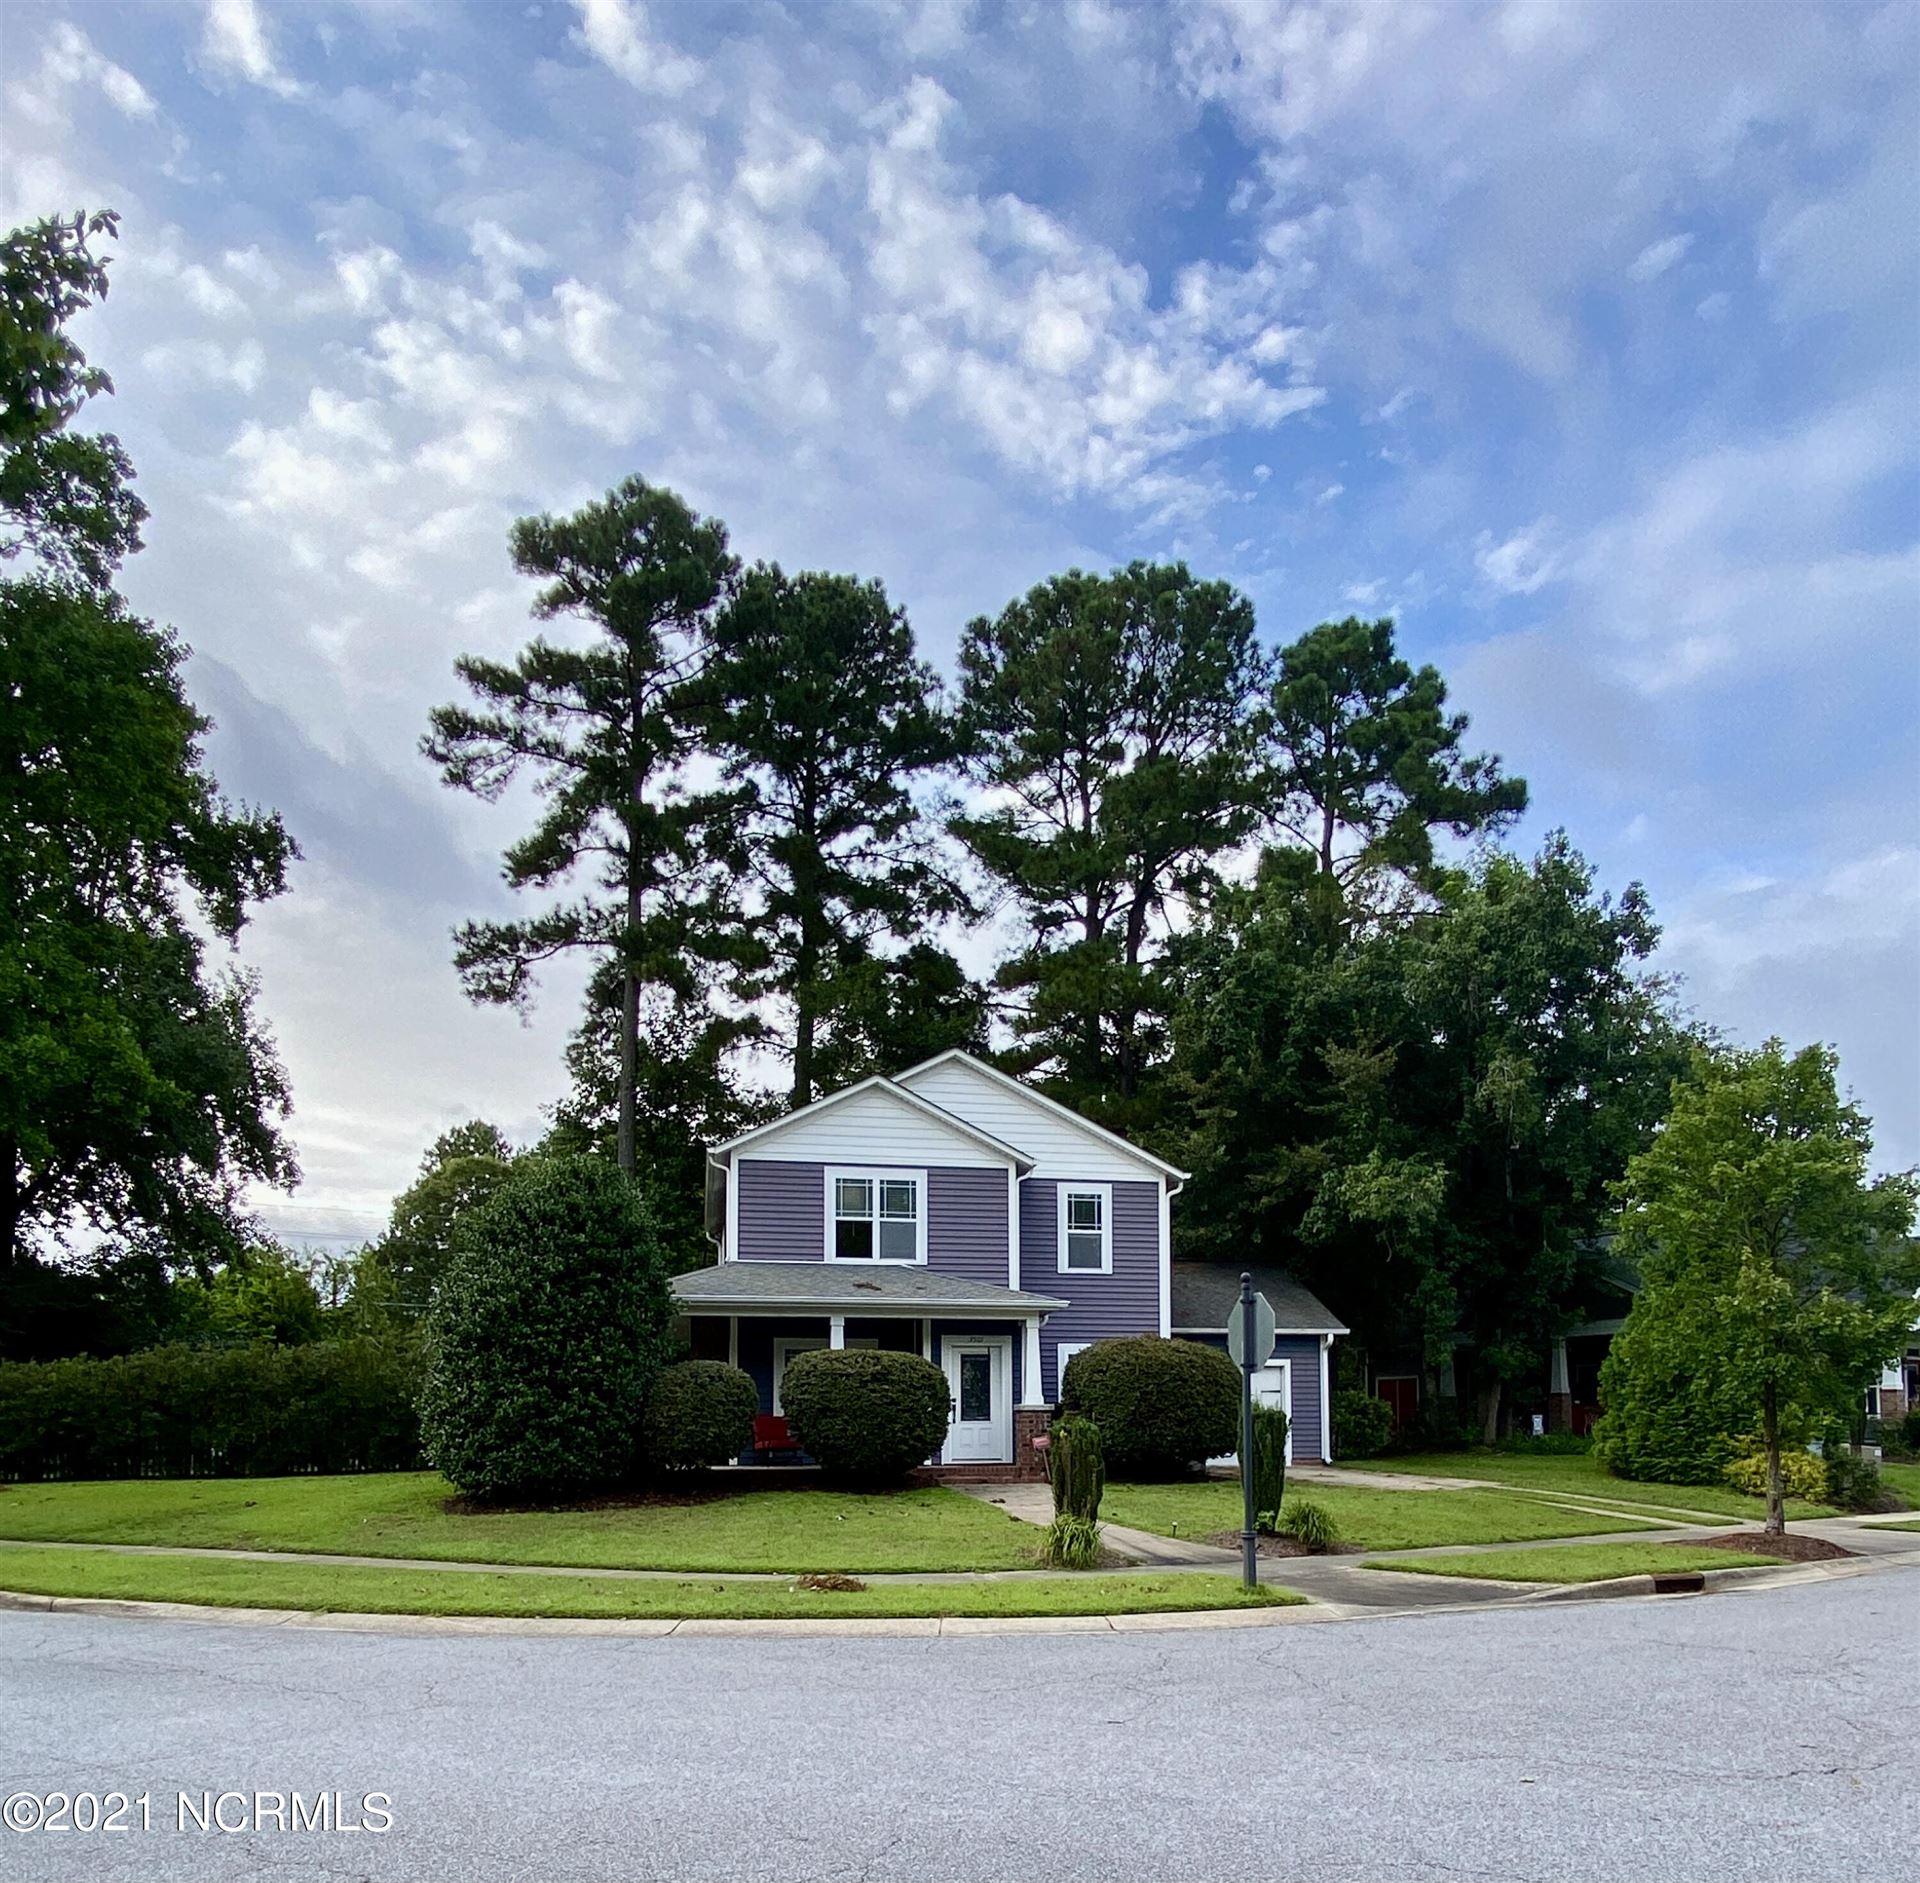 Photo of 3501 Cattail Lane, Greenville, NC 27858 (MLS # 100285023)